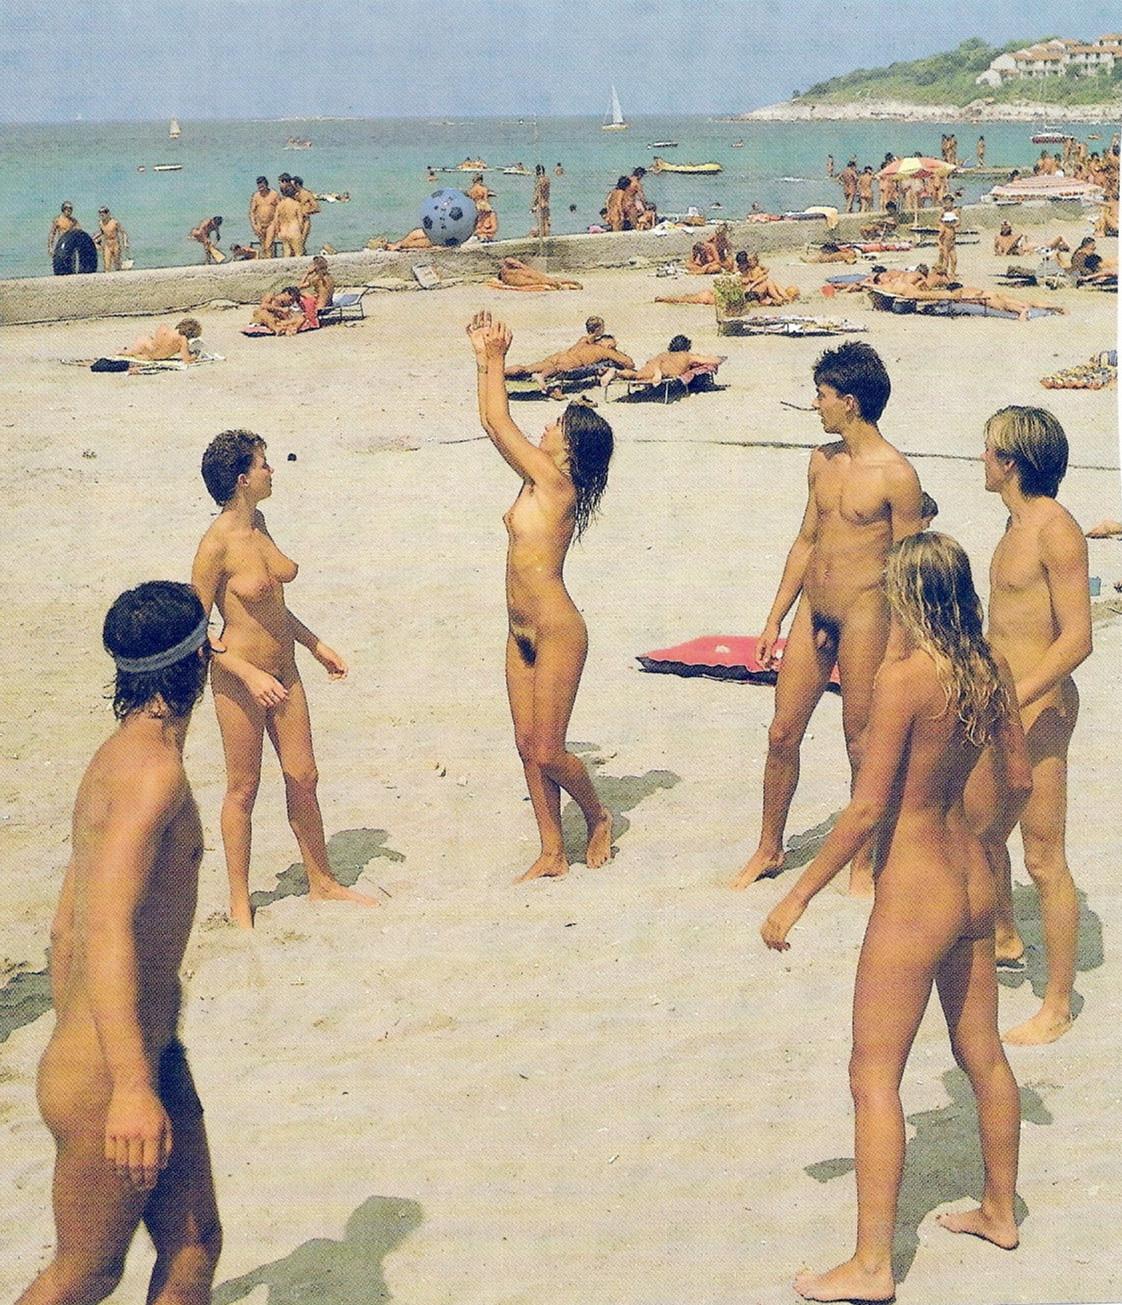 https://www.nudismlife.com/galleries/nudists_and_nude/the_most_natural_nudists/the_most_natural_nudists_0086.jpg